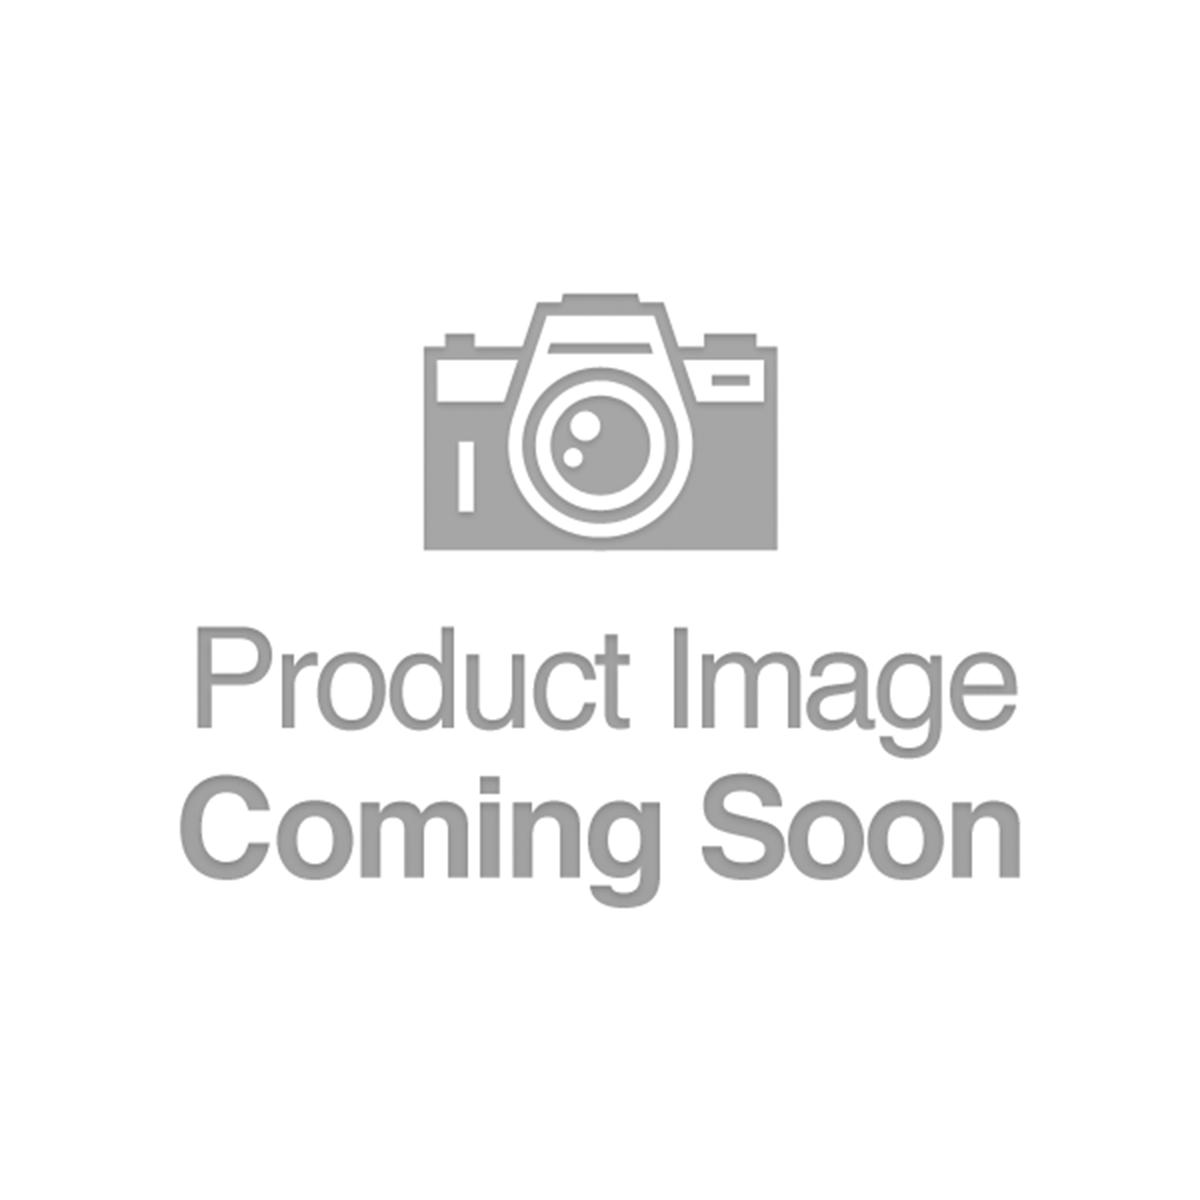 Norfolk - Virginia - CH 10194 - FR 654 - PMG 63 EPQ